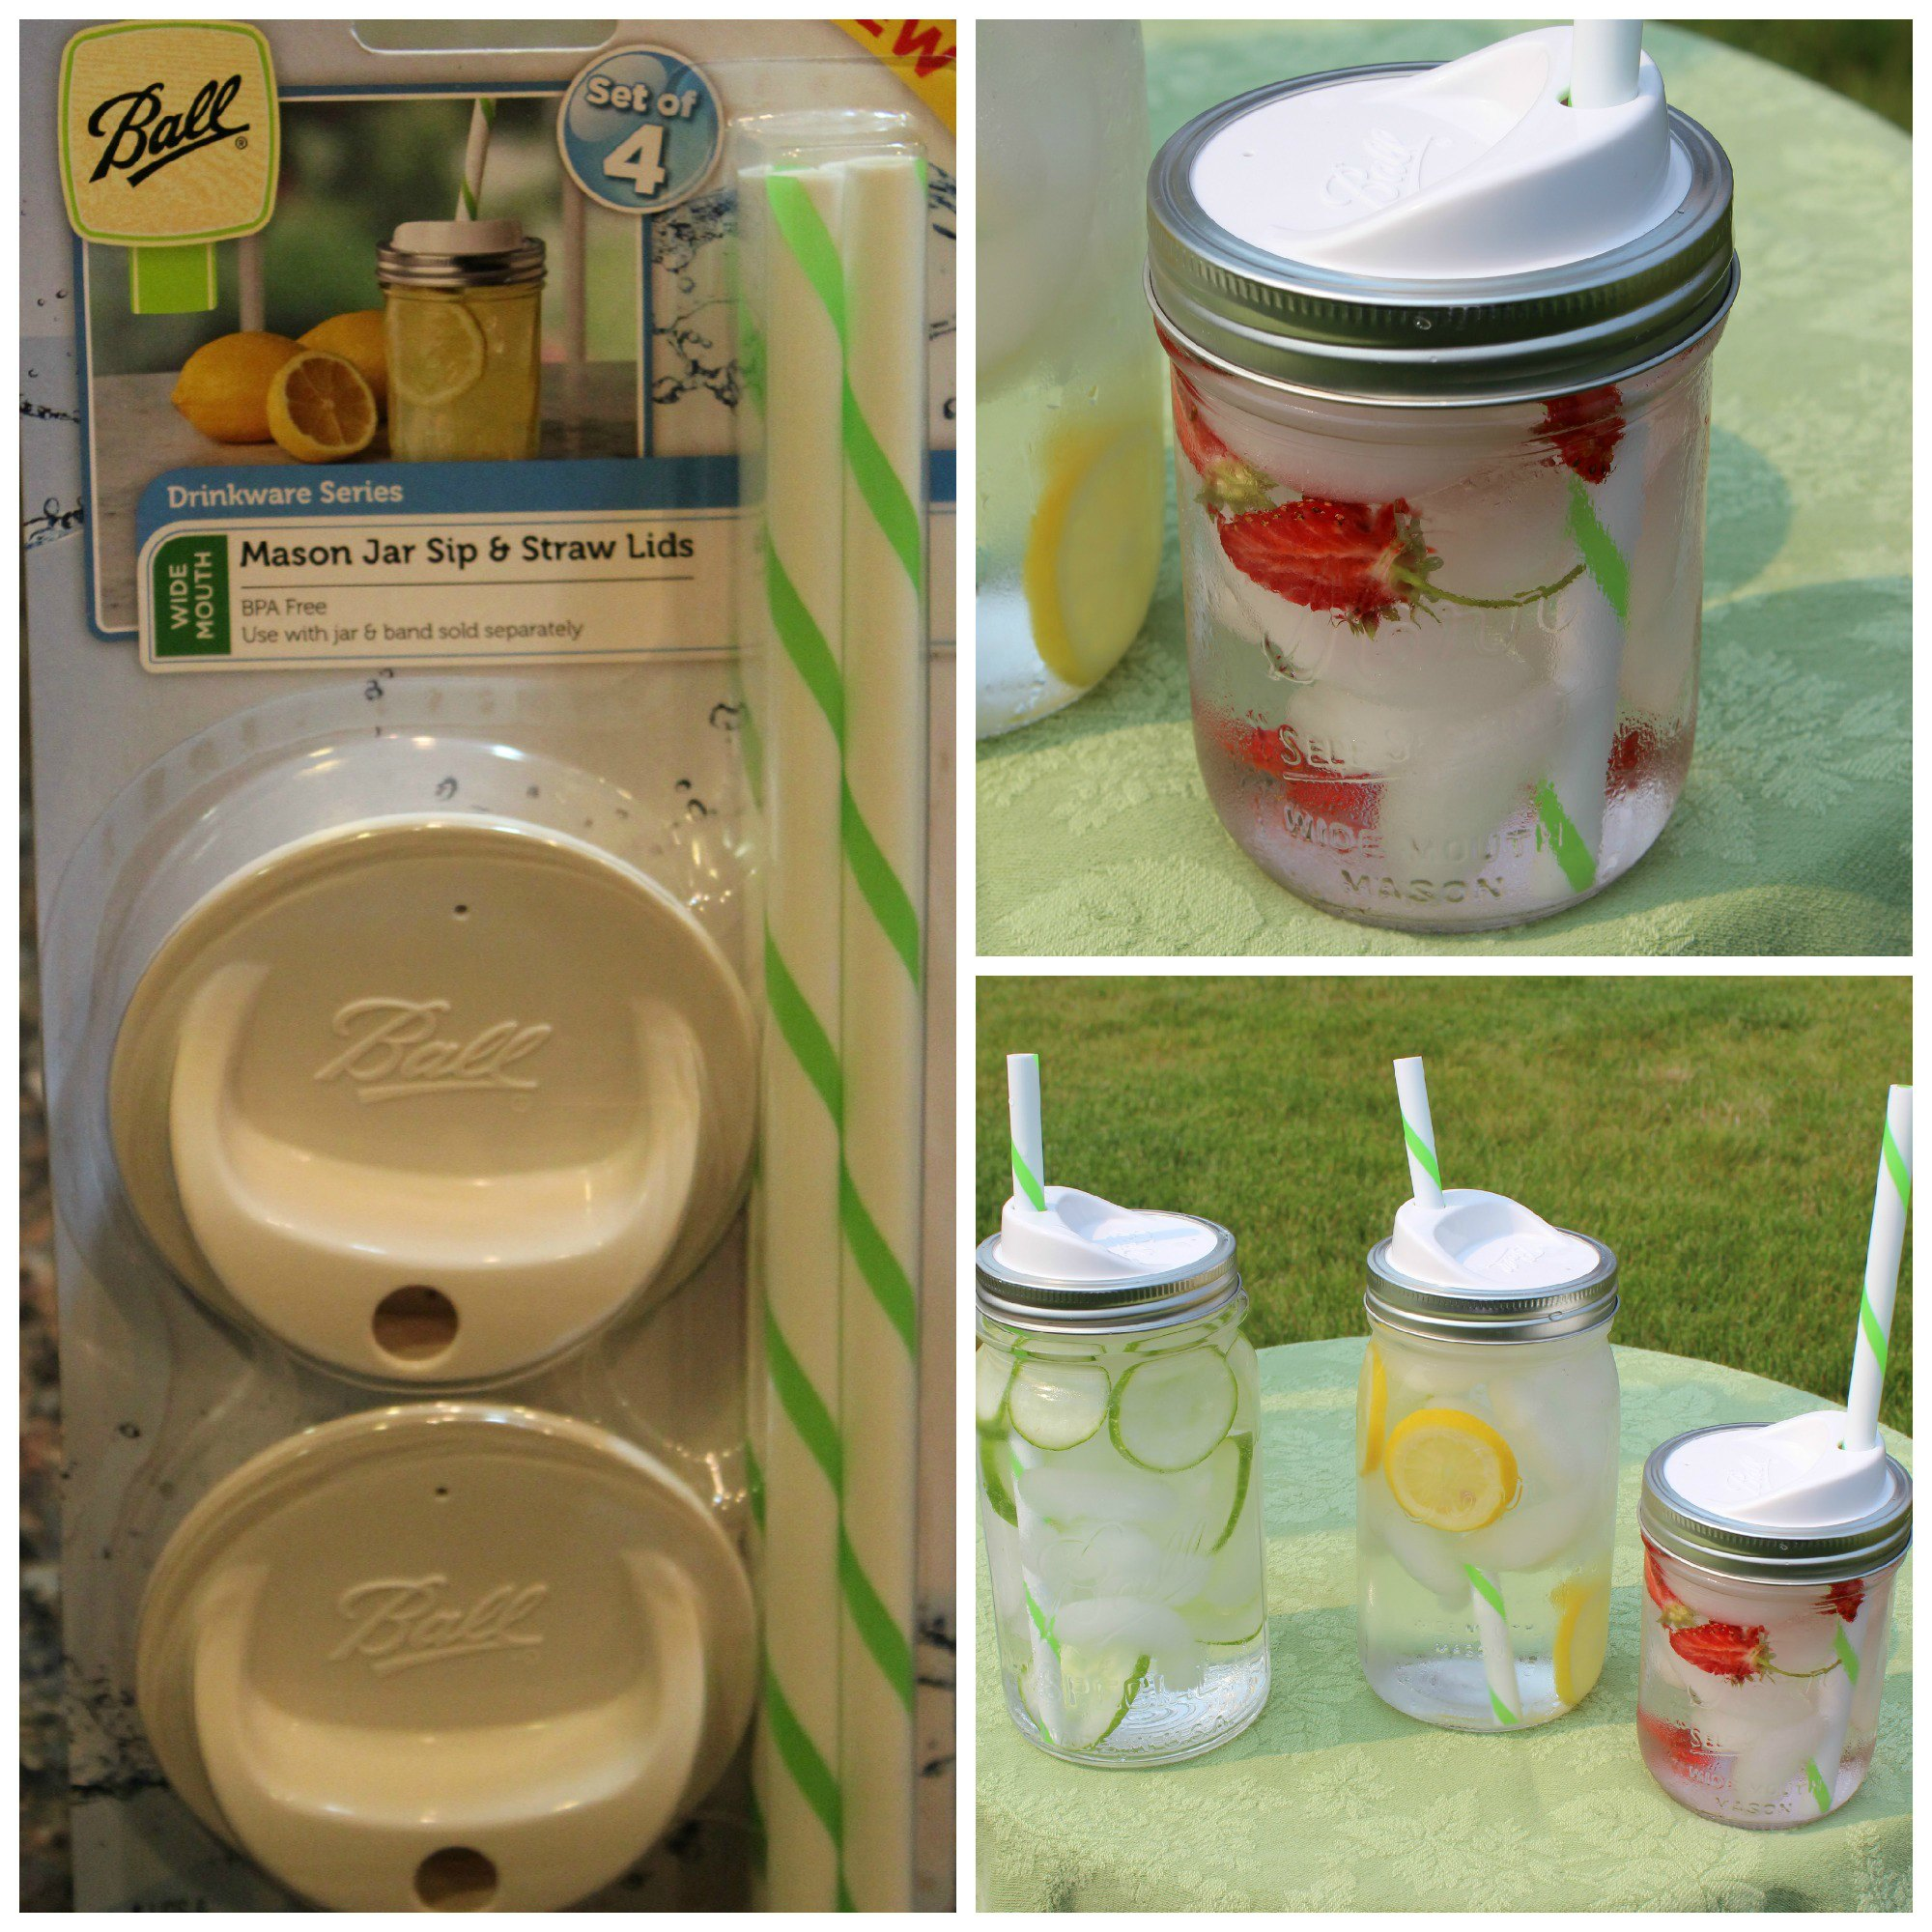 Mason Jar Sip And Straw Lids Product Review Mirlandras Kitchen